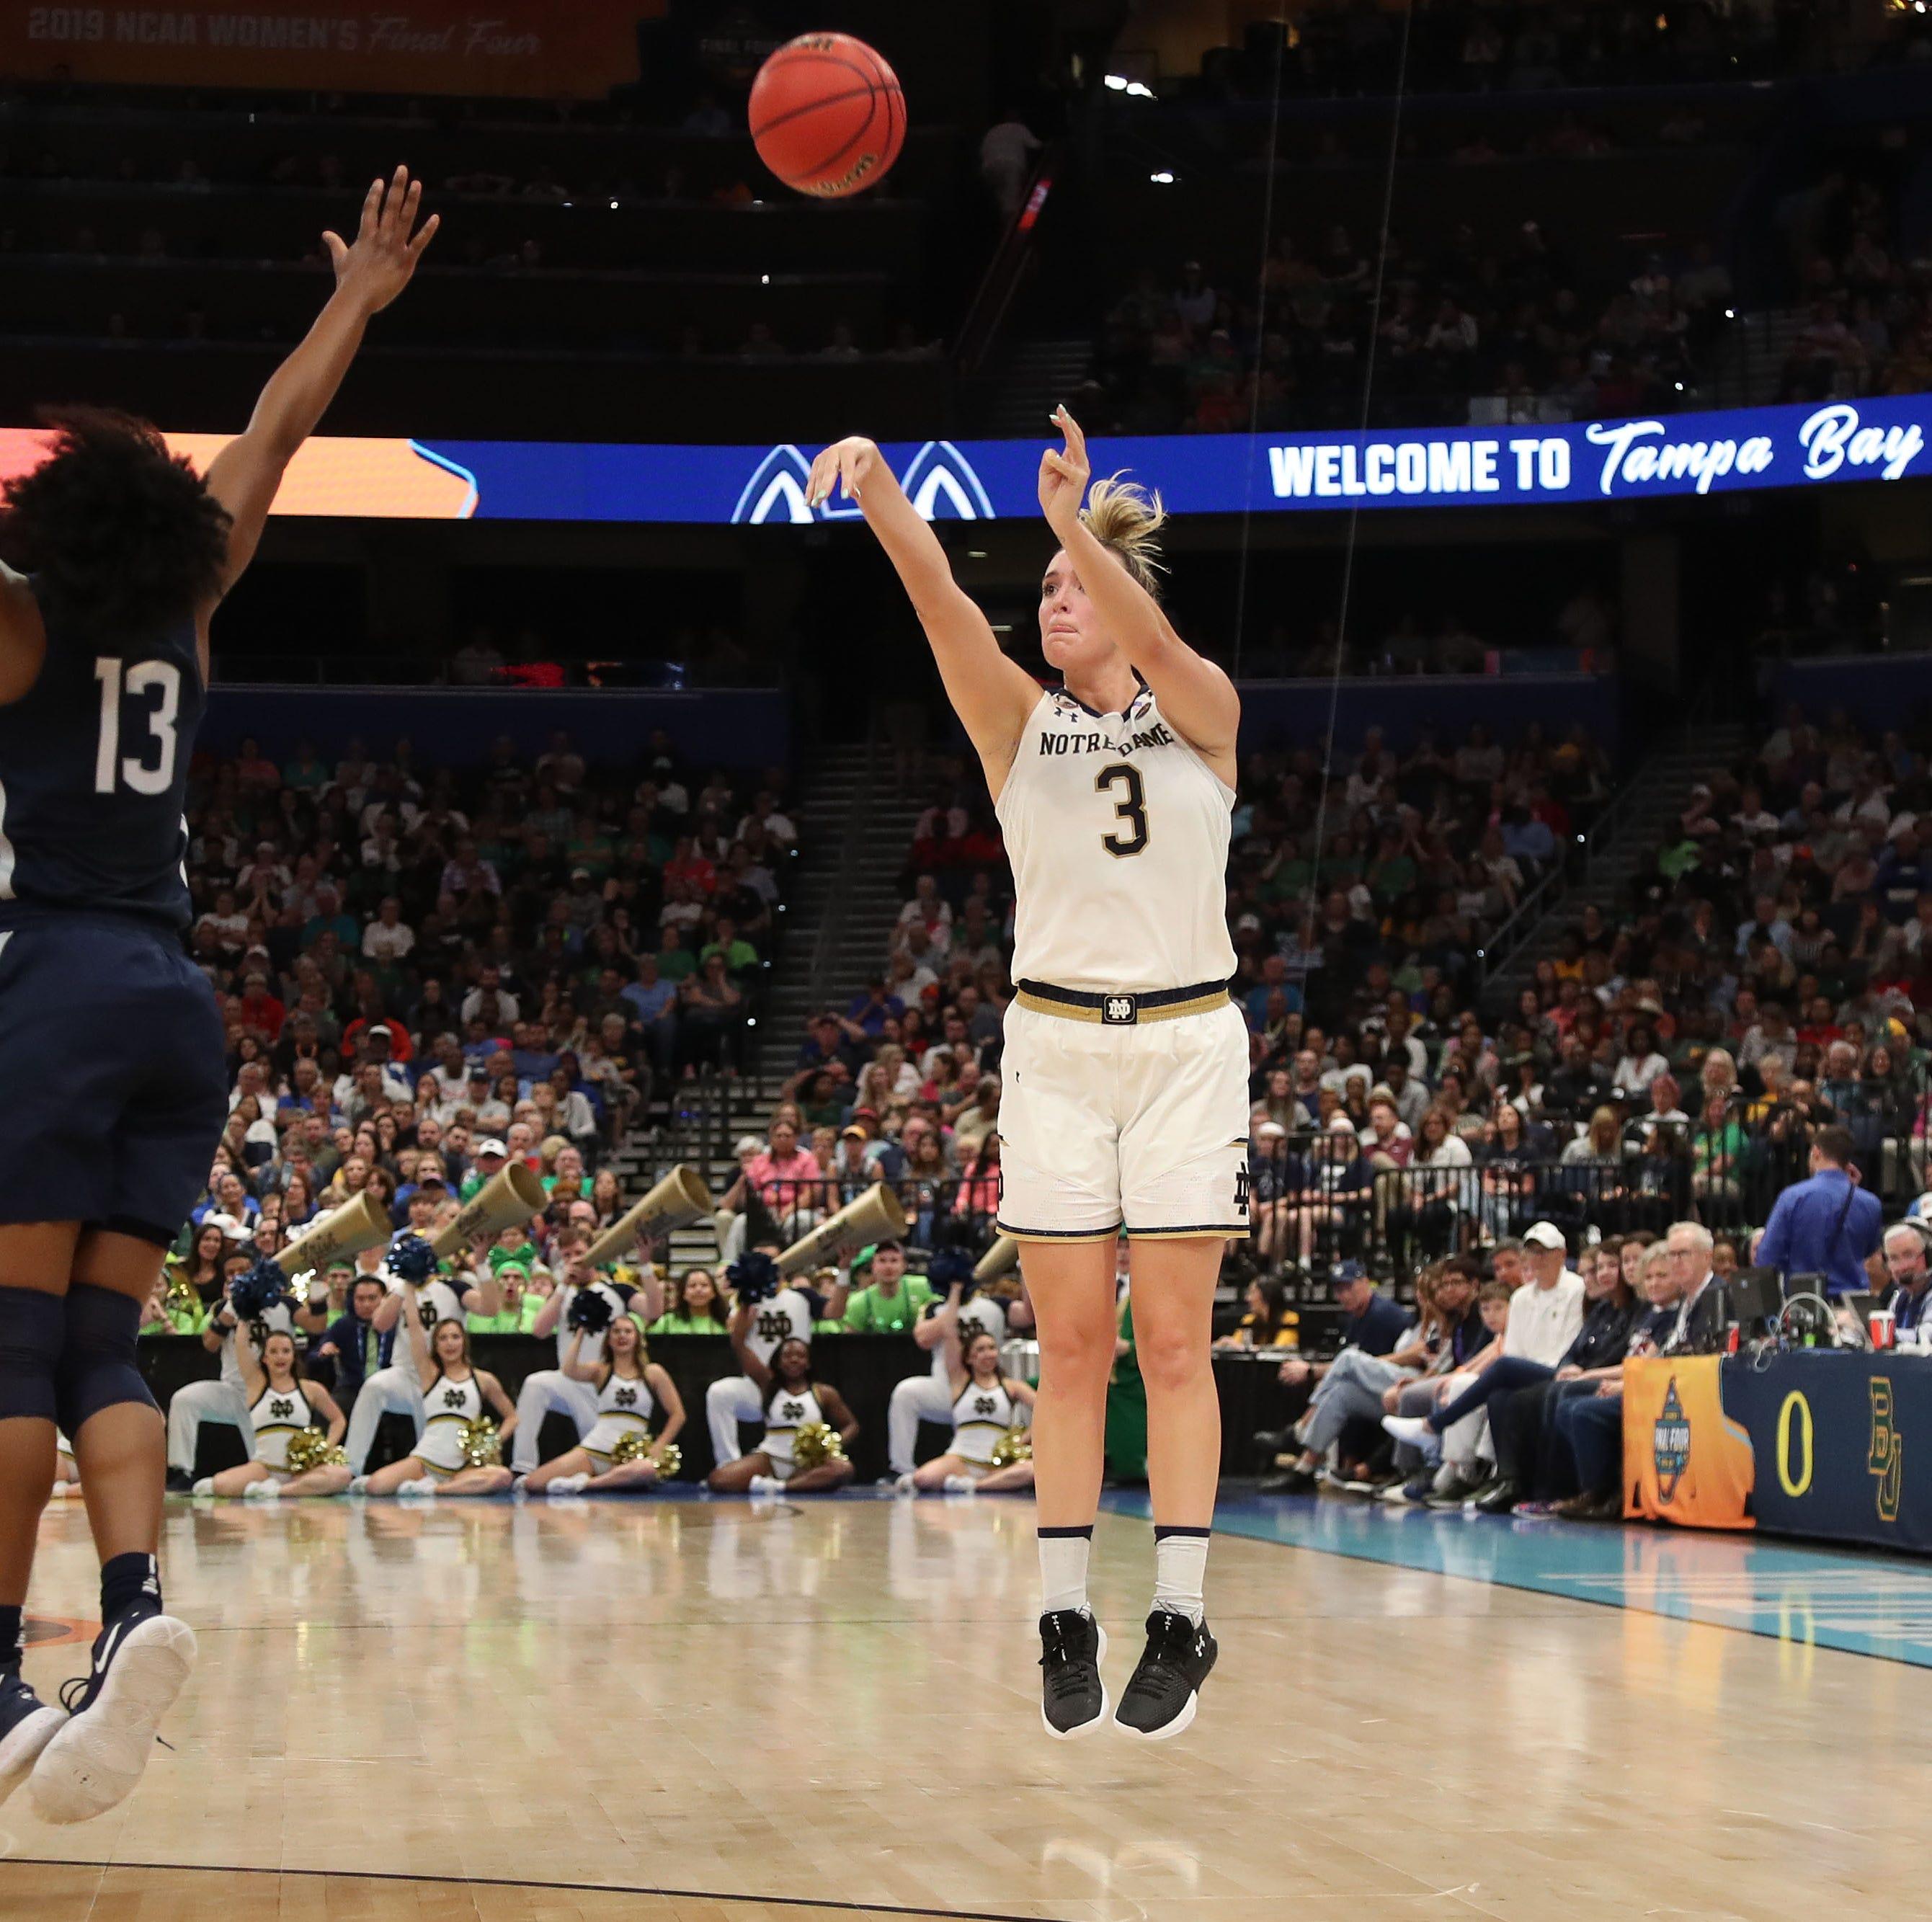 WNBA Draft 2019: Marina Mabrey selected by Los Angeles Sparks